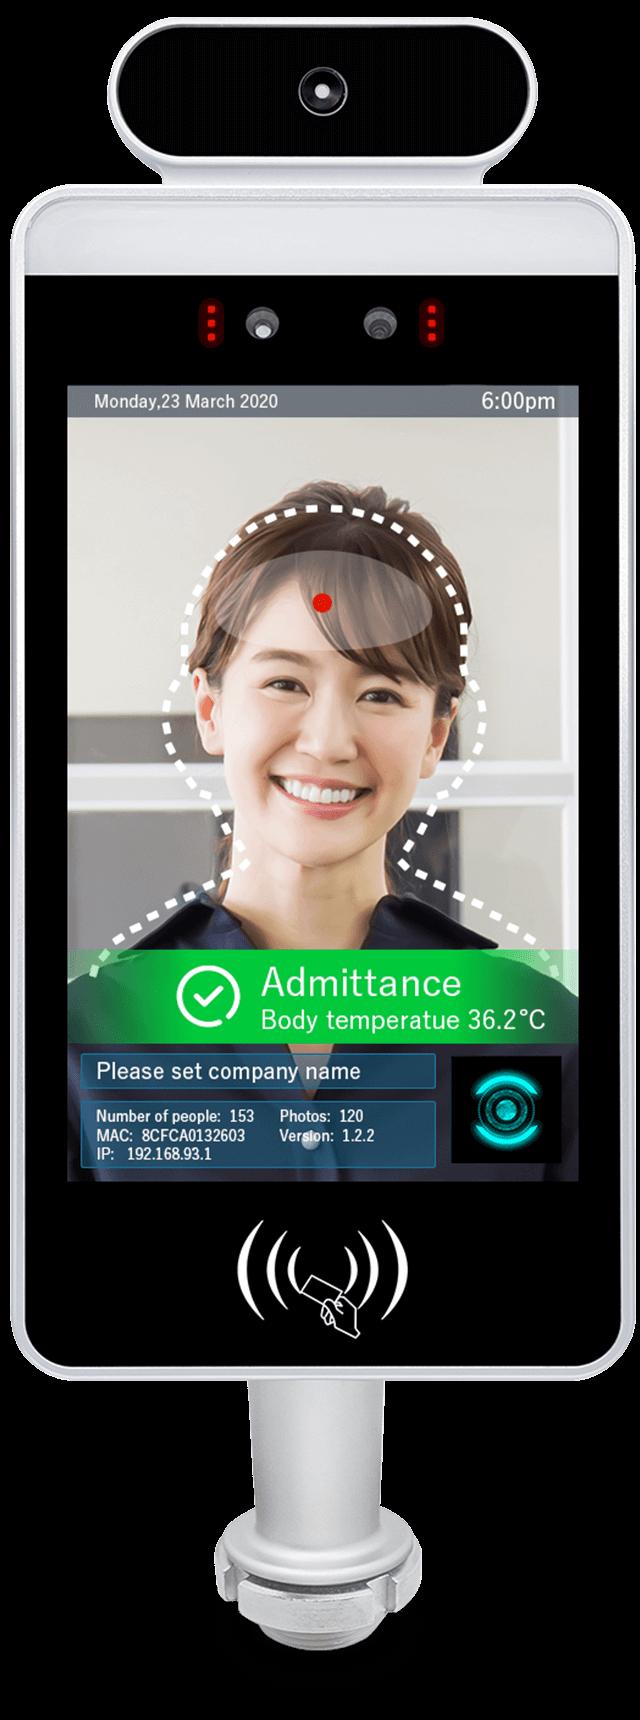 Smart Lock Series NinjalockEntrance / スマートロックシリーズ ニンジャエントランス 検温機能つき顔認証 エントランスシステム